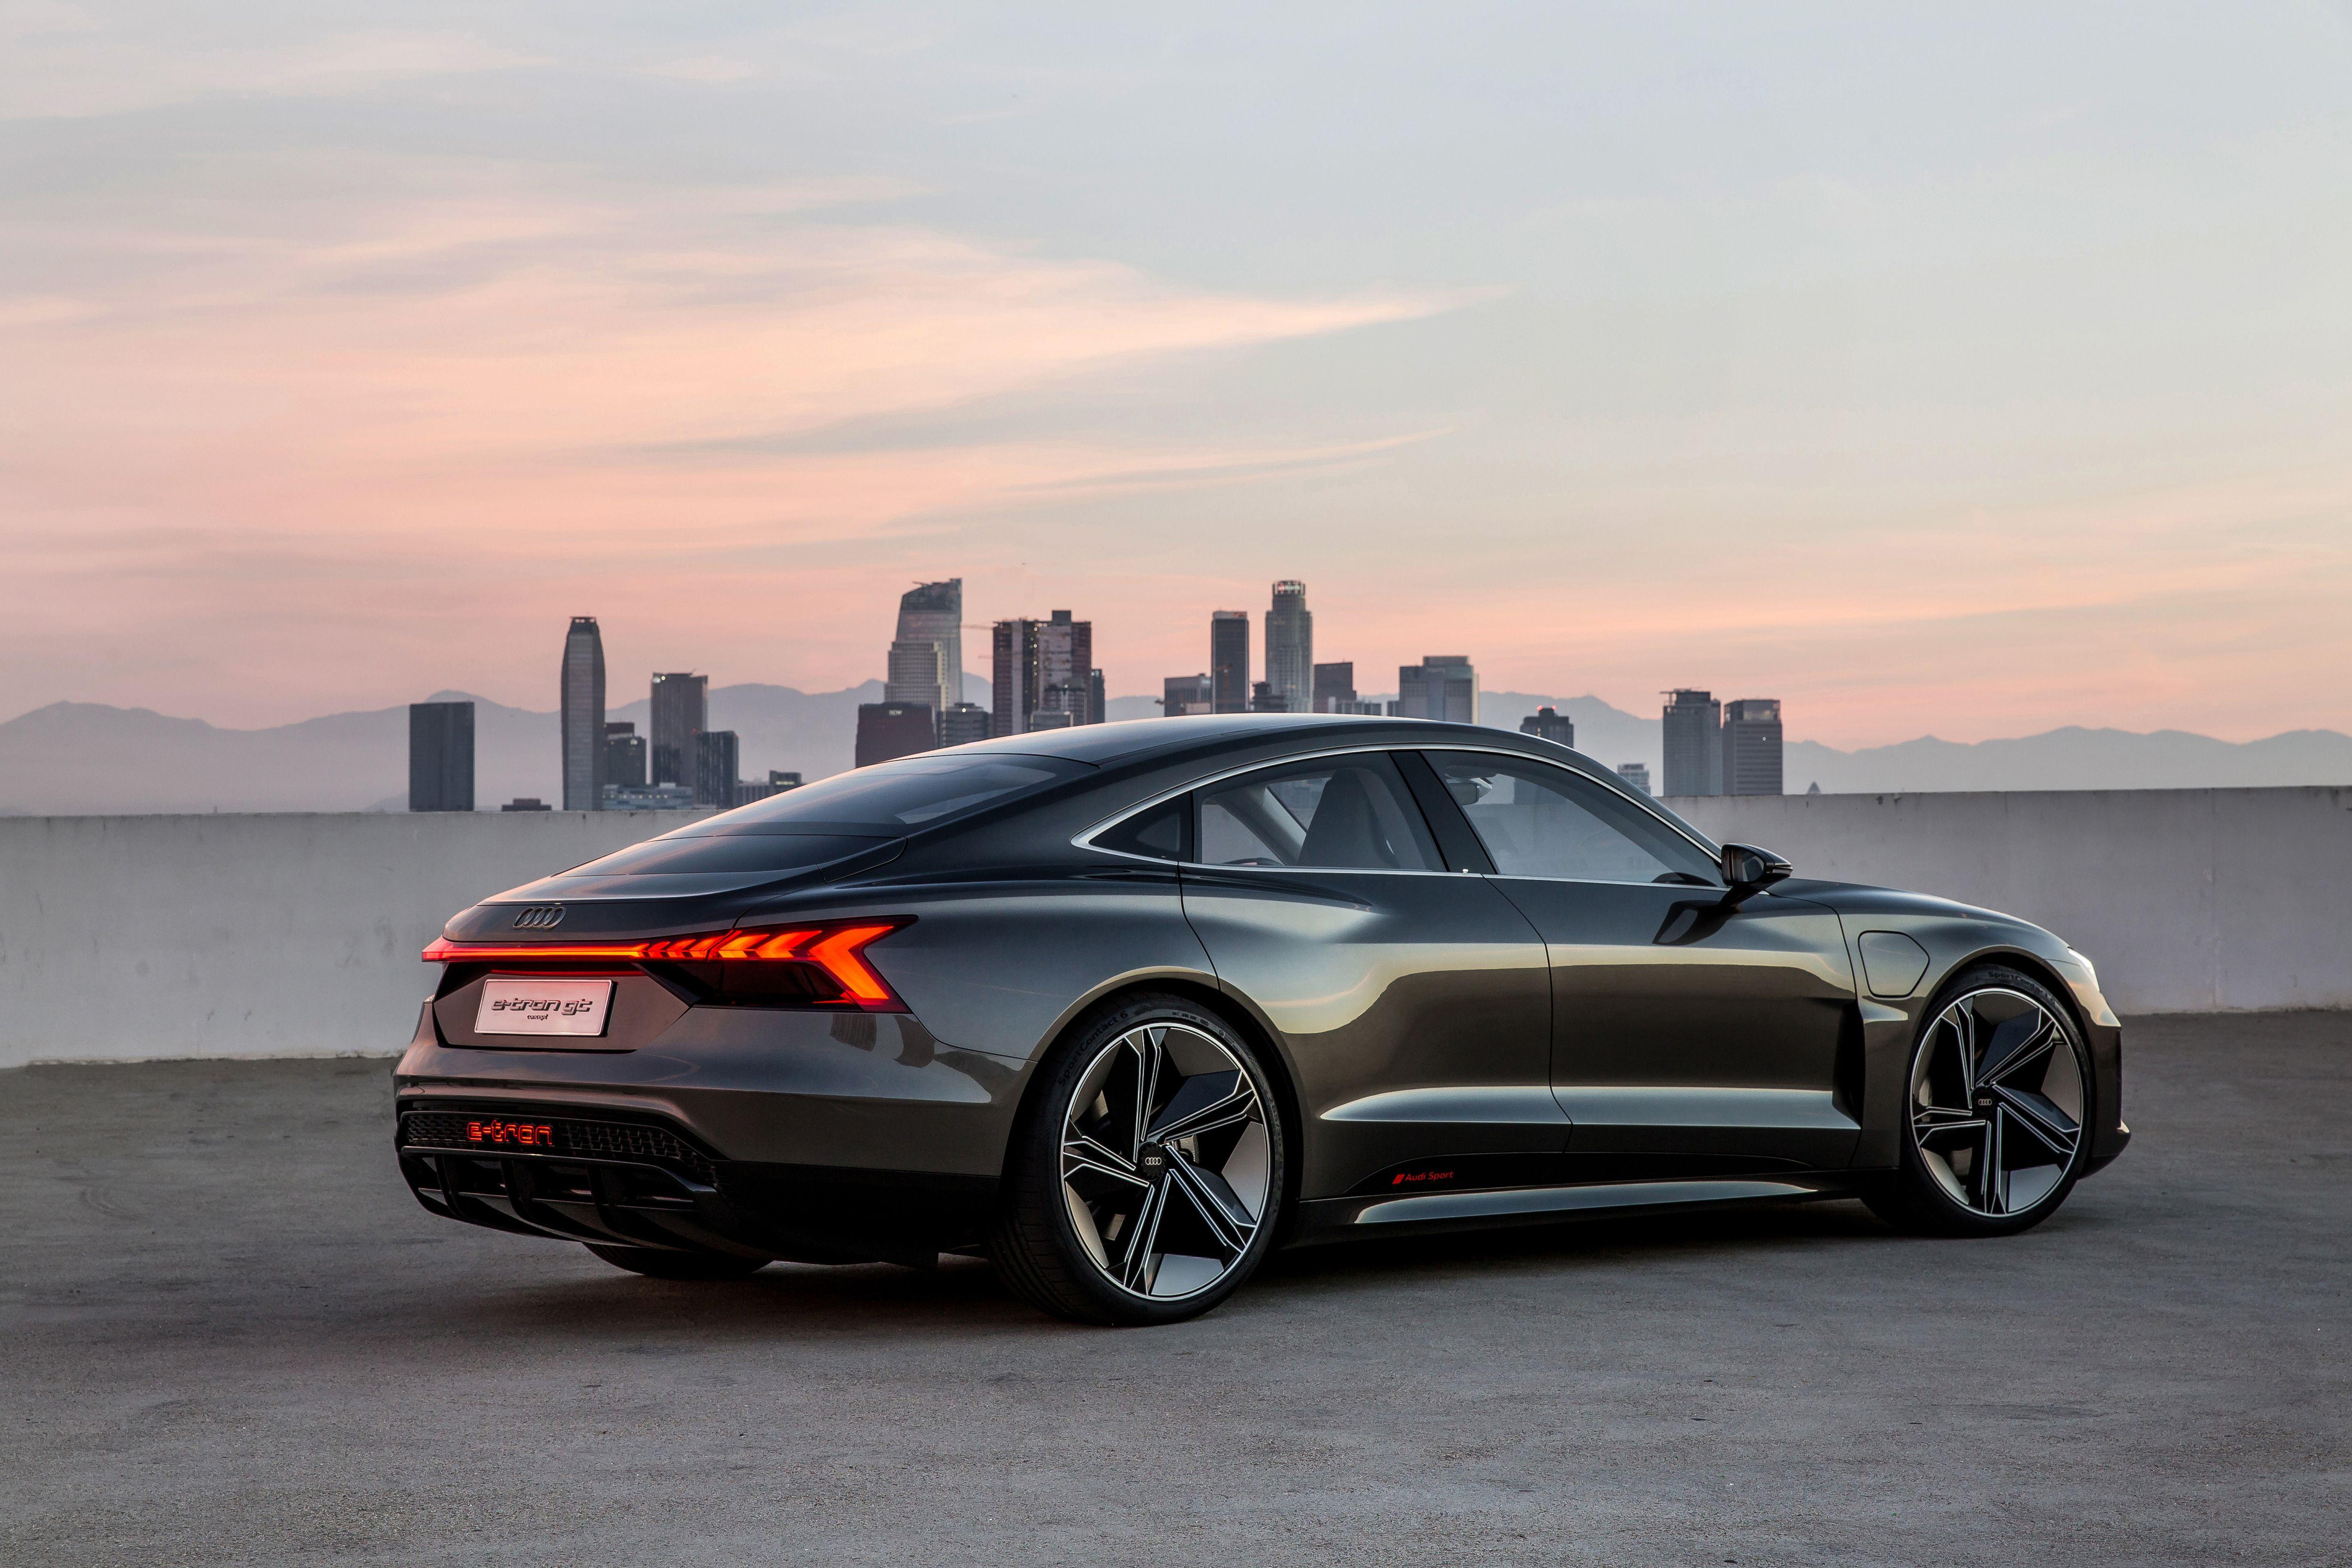 Eton Gt Interior I 2020 Cabriolet Audi Coupe